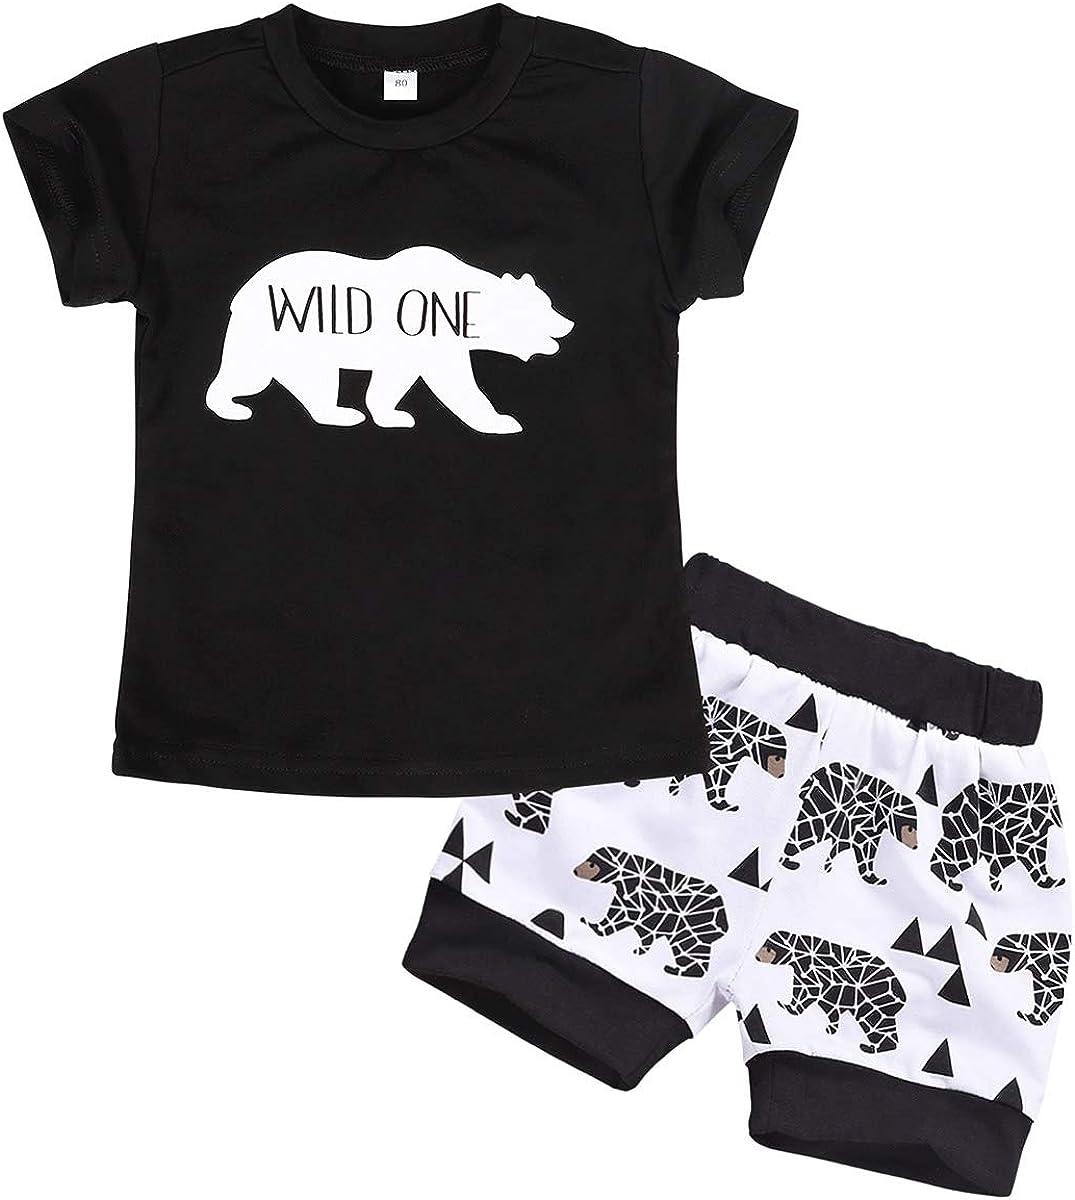 AmzBarley Toddler Boys Clothes Kids Summer Outifts Set Animal Printed Top + Shorts Set